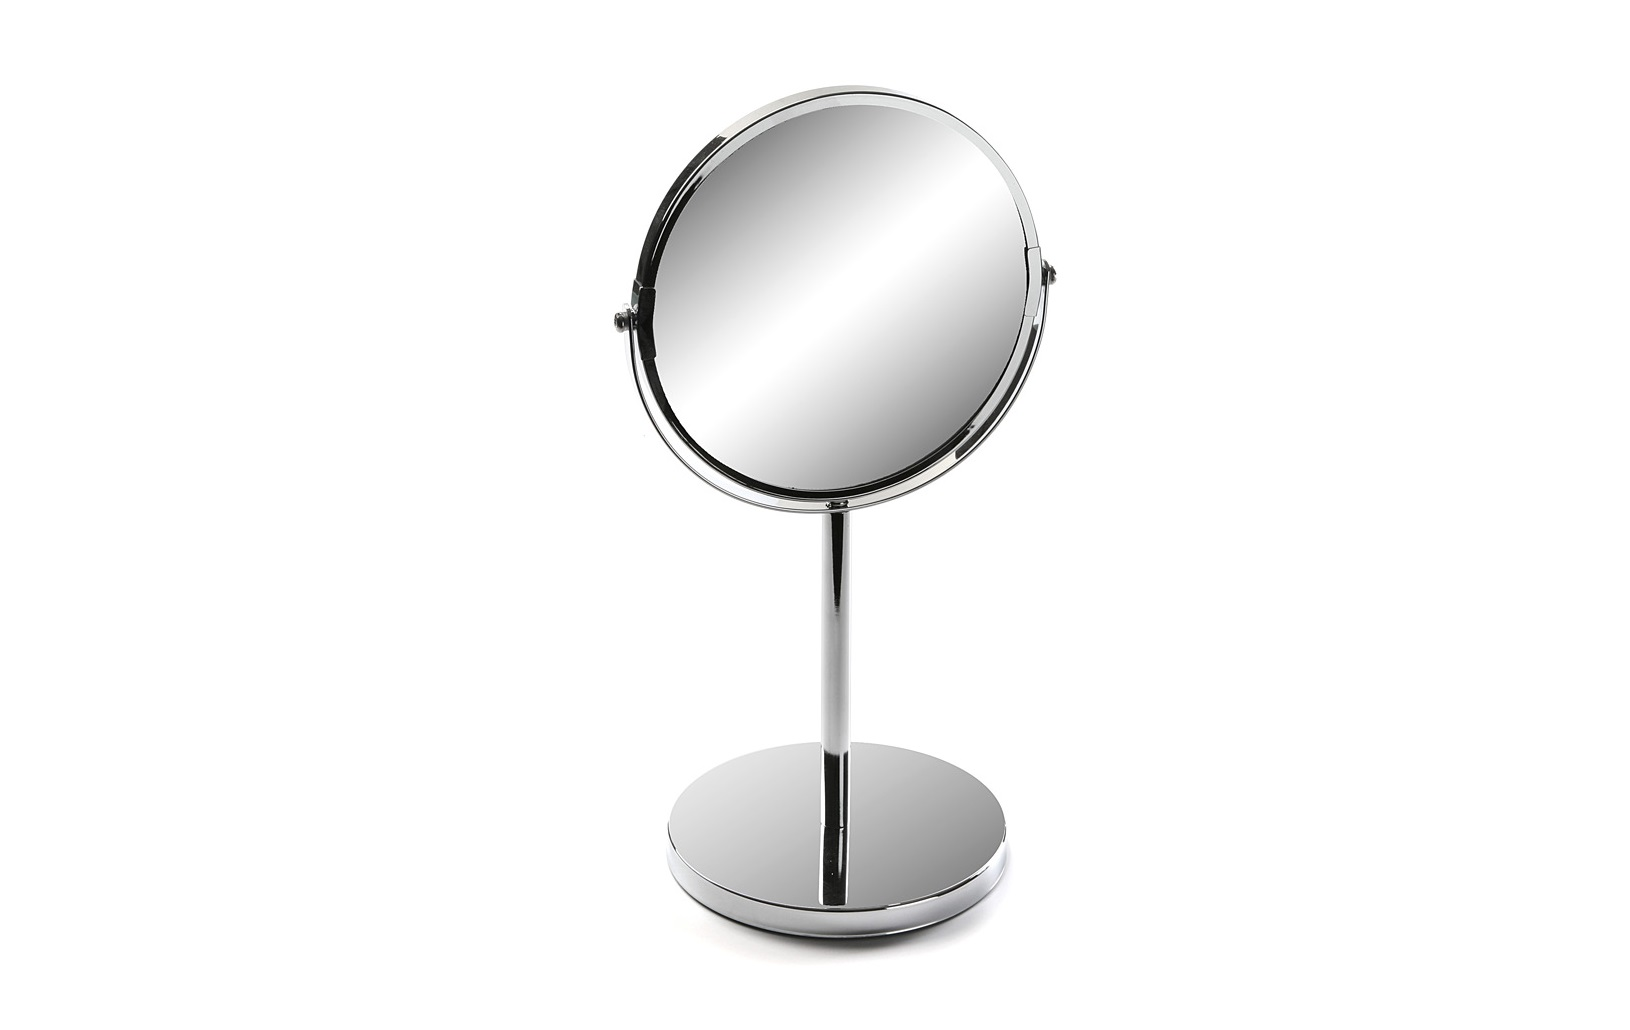 Зеркало настольноеНастольные зеркала<br><br><br>Material: Стекло<br>Length см: None<br>Width см: 17<br>Depth см: 15<br>Height см: 34.5